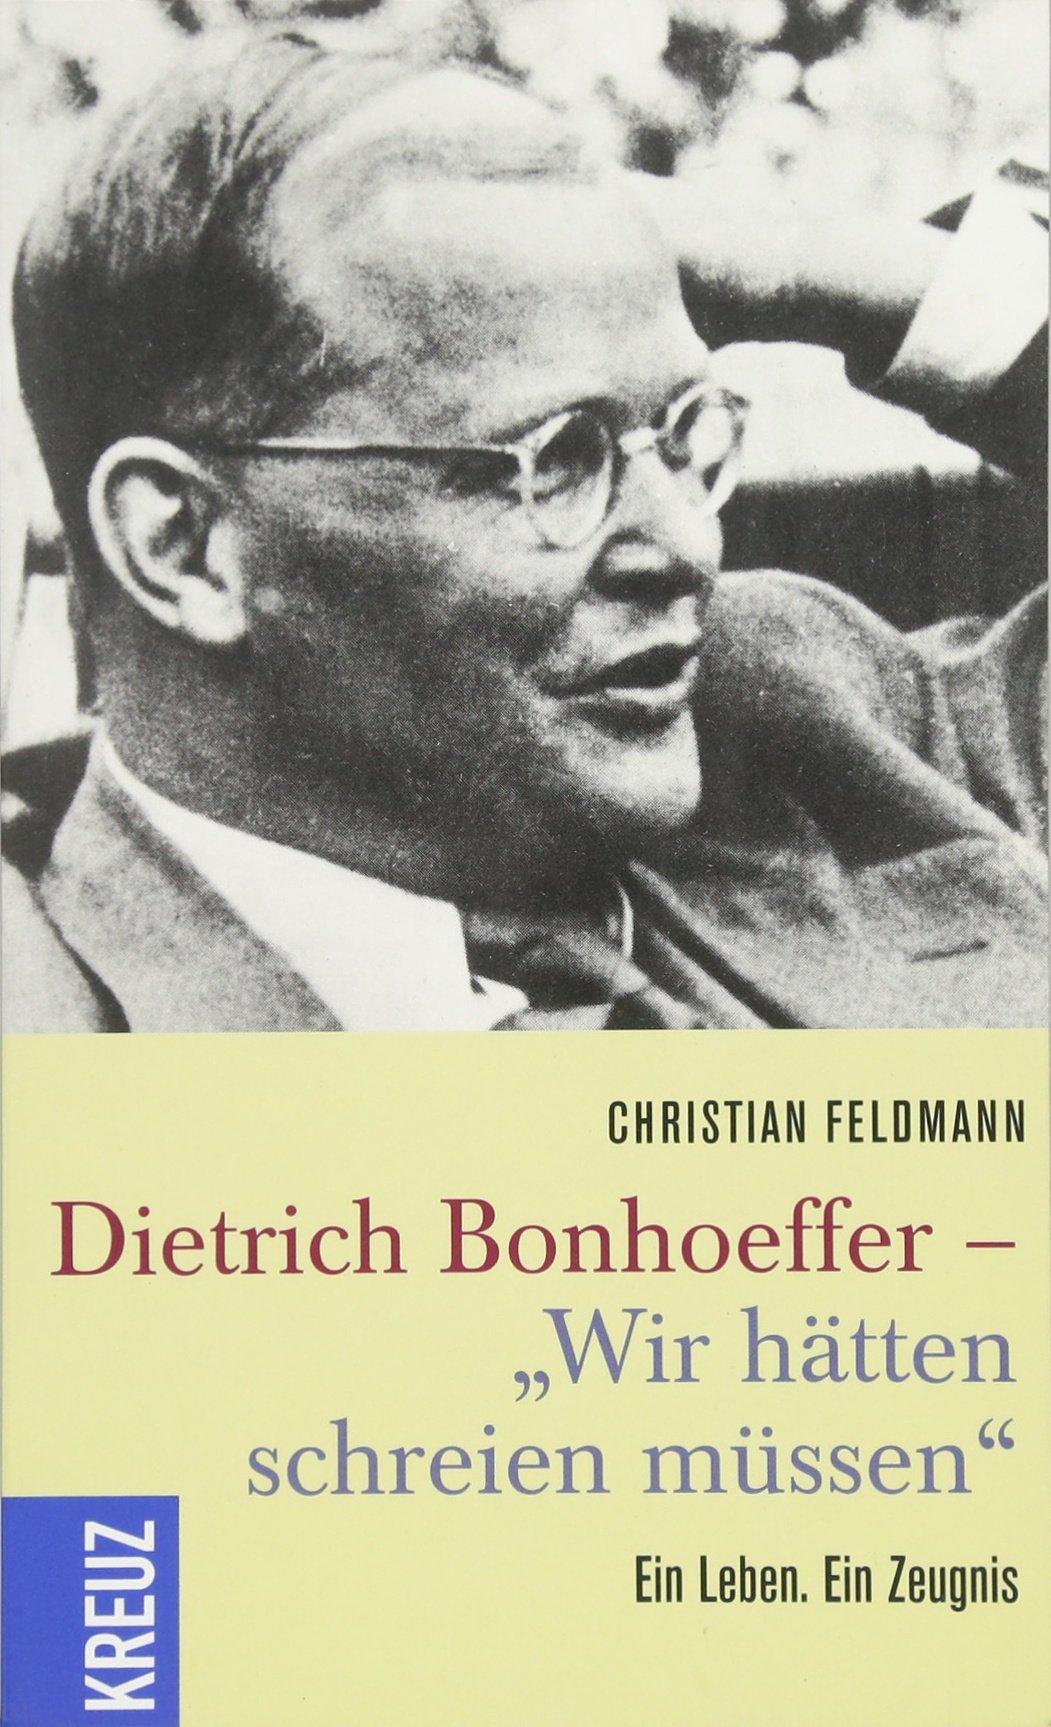 Dietrich Bonhoeffer -